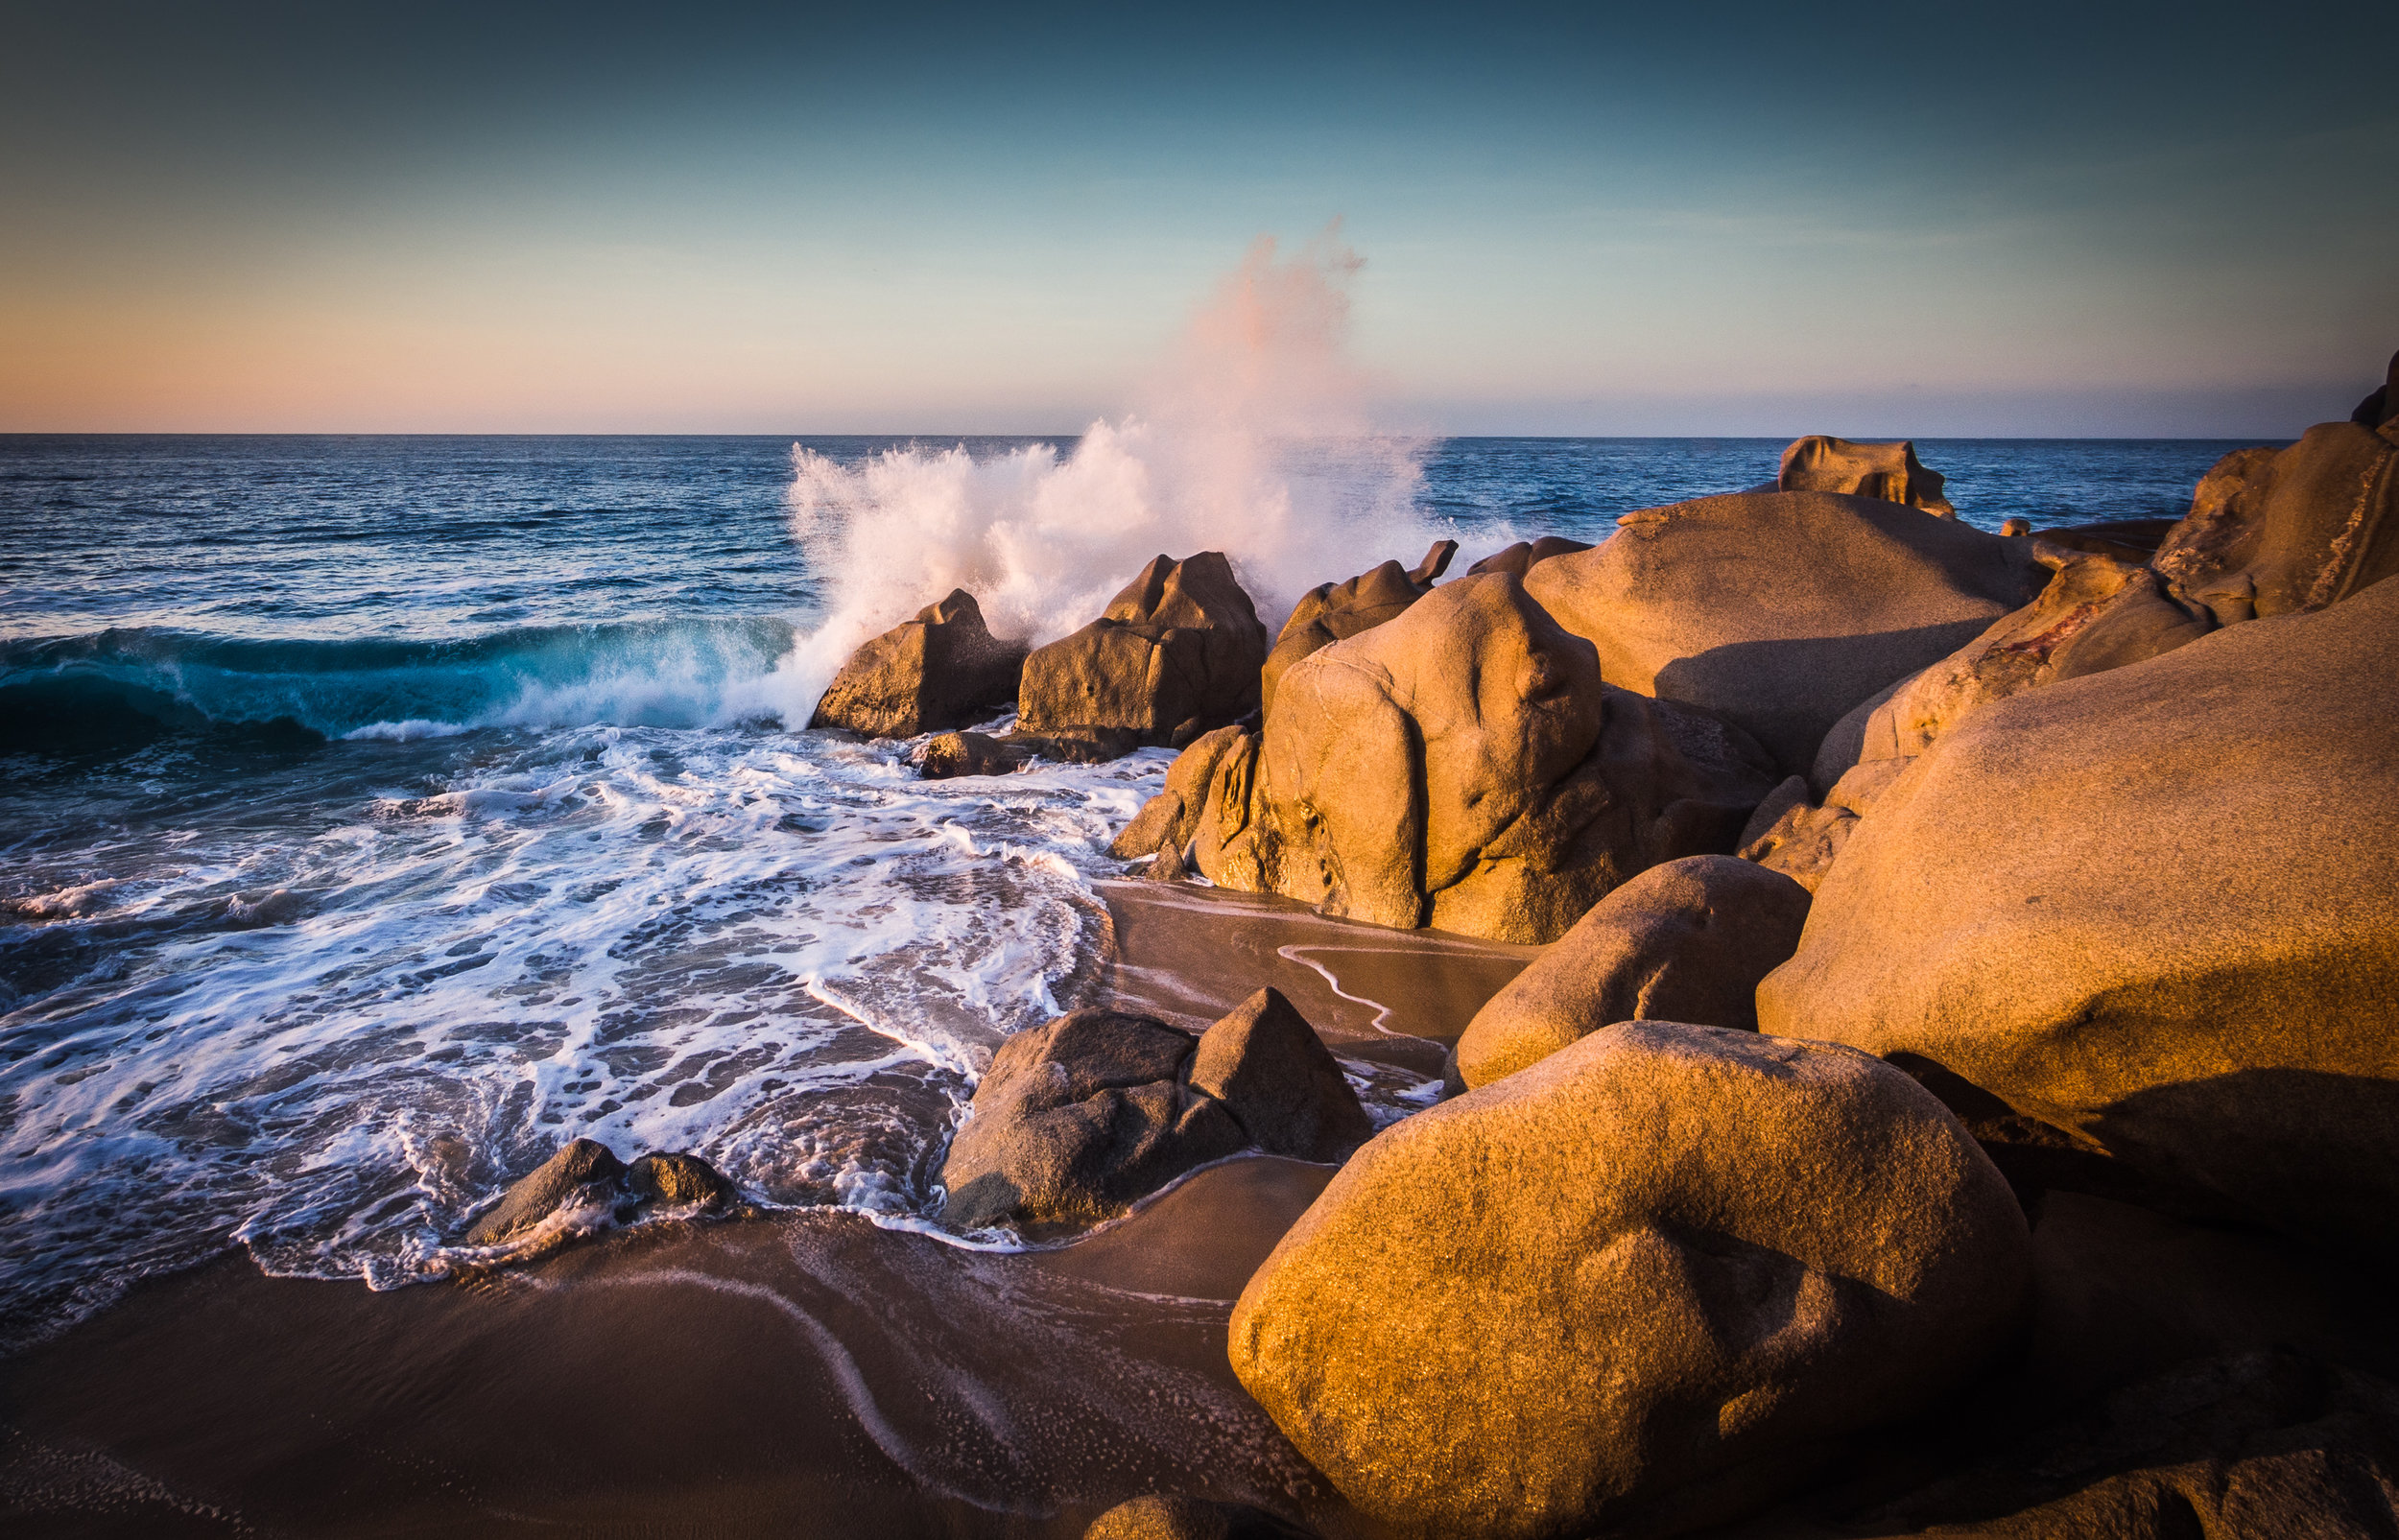 Breaking Waves at Dawn - Cabo San Lucas-4608 x 3456.jpg